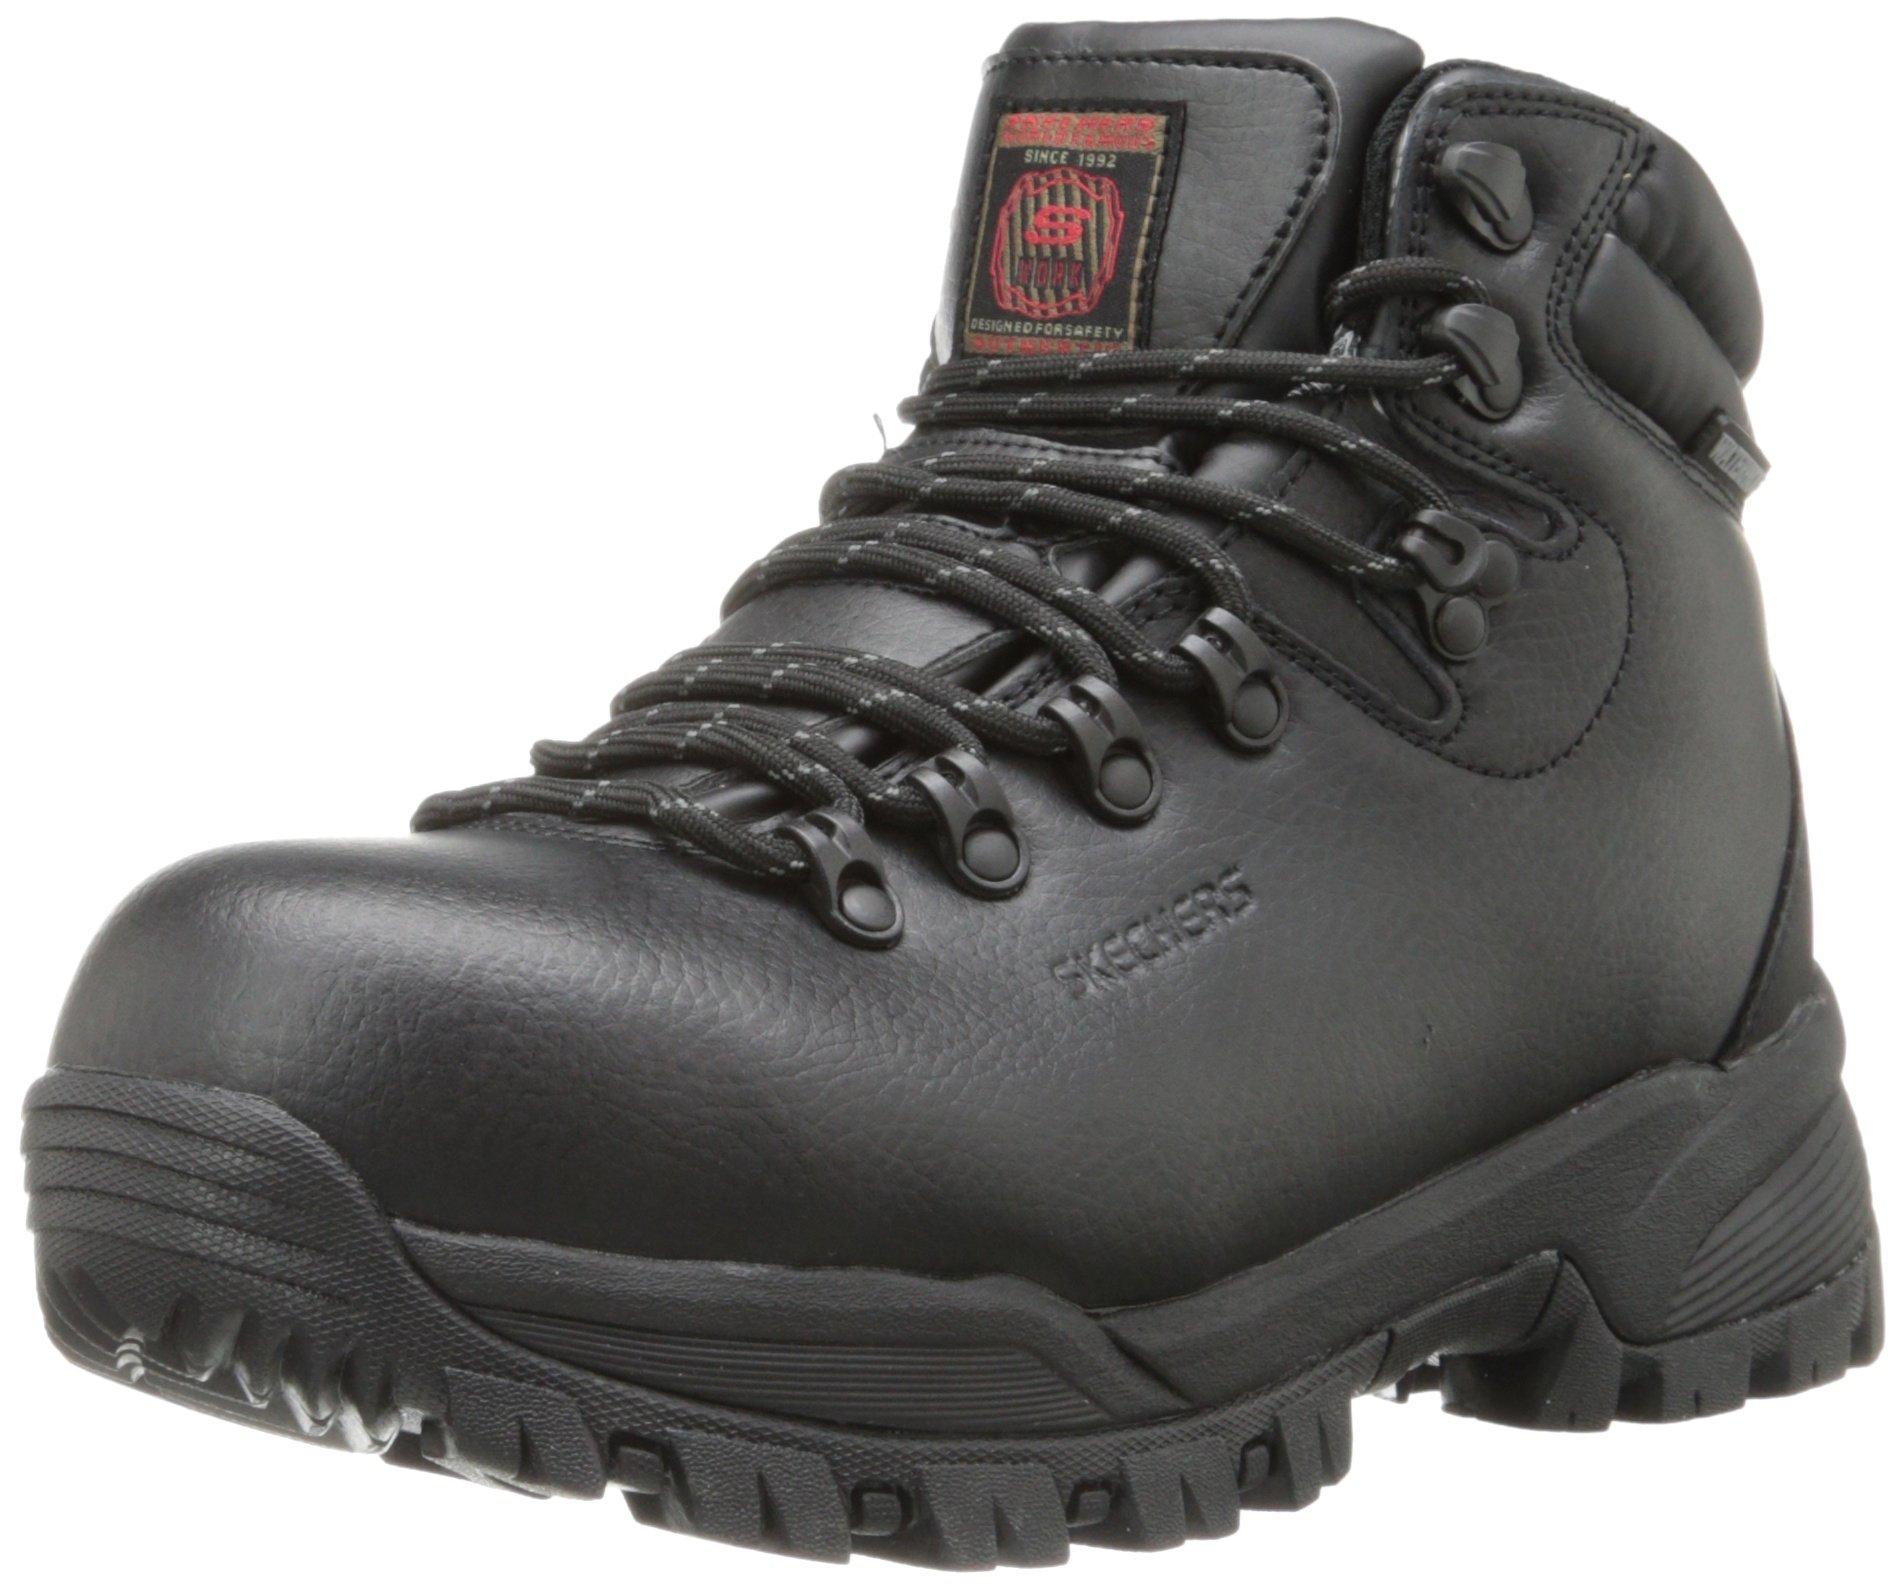 Skechers for Work Men's Vostok Slip Resistant Work Boot,Black,12 M US